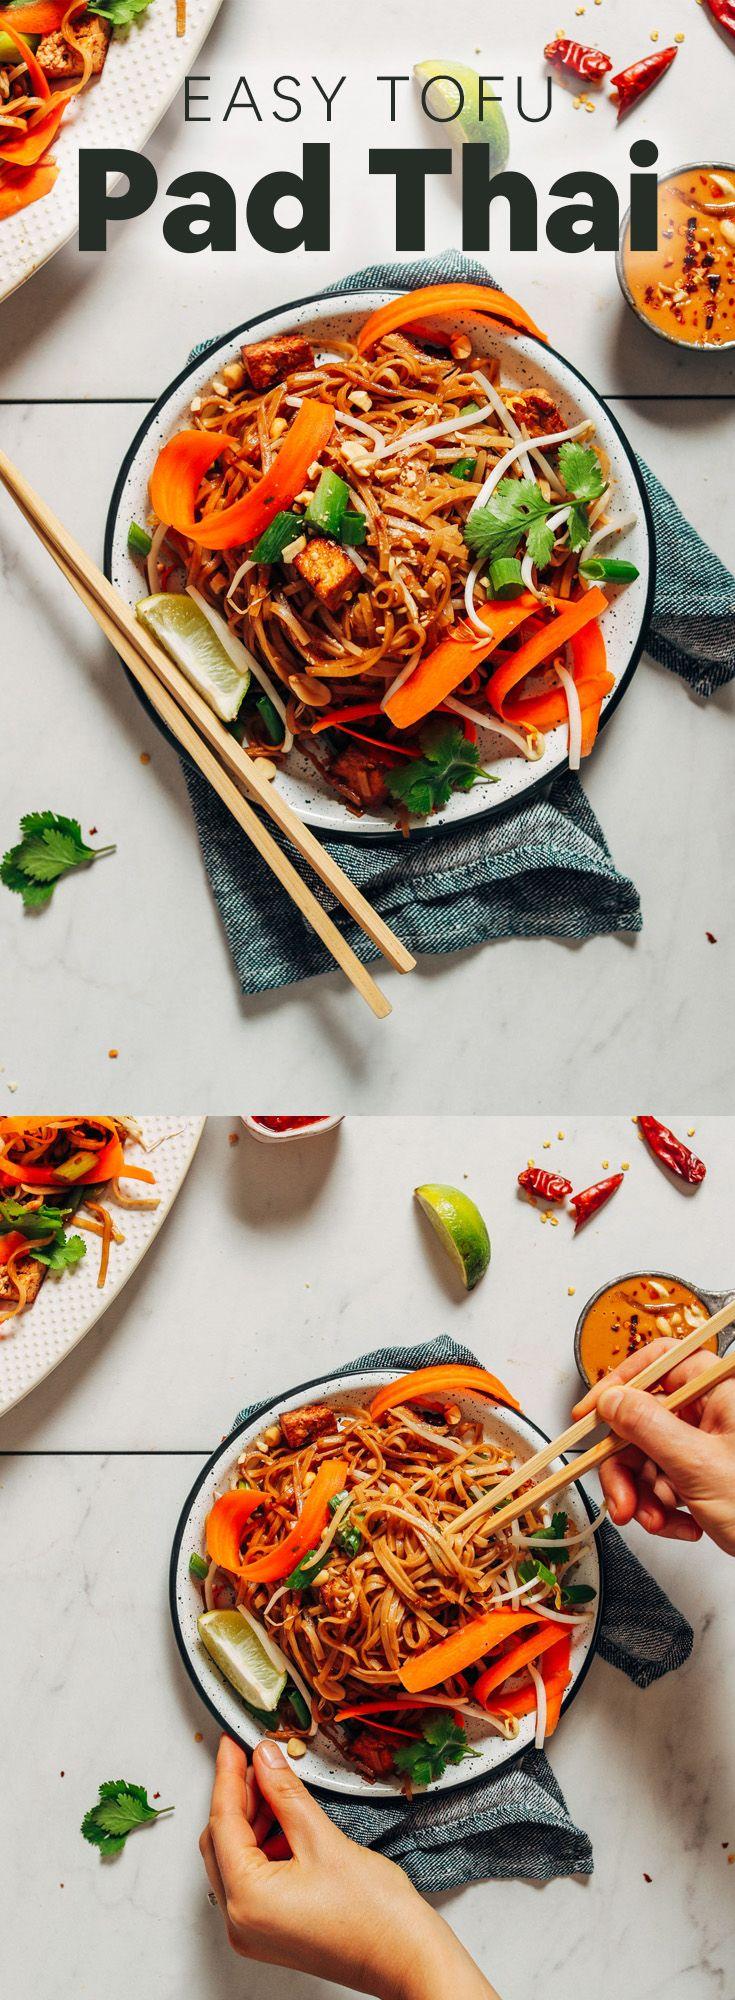 Easy Tofu Pad Thai